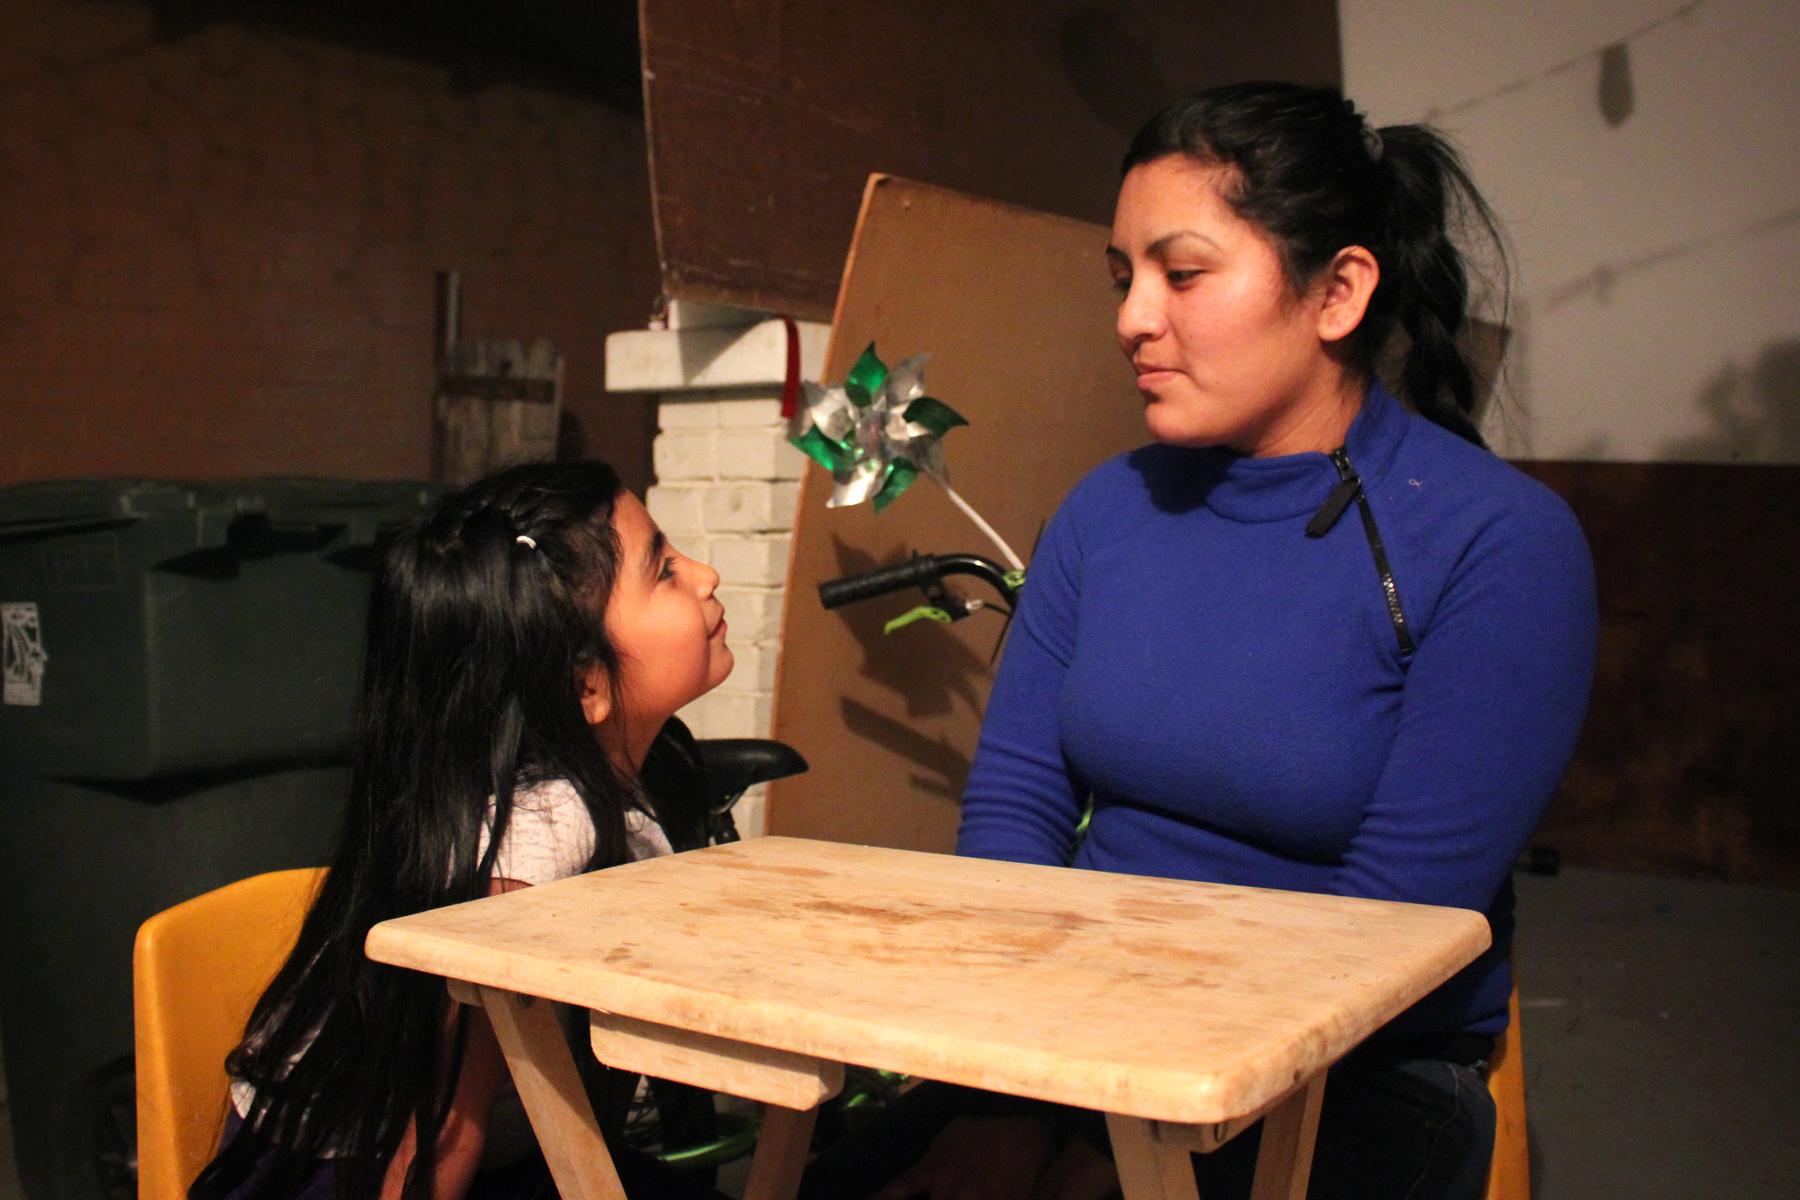 Farm worker Lorena Hernandez (right) with her daughter Luzliliana. Photo: Dan Charles/NPR